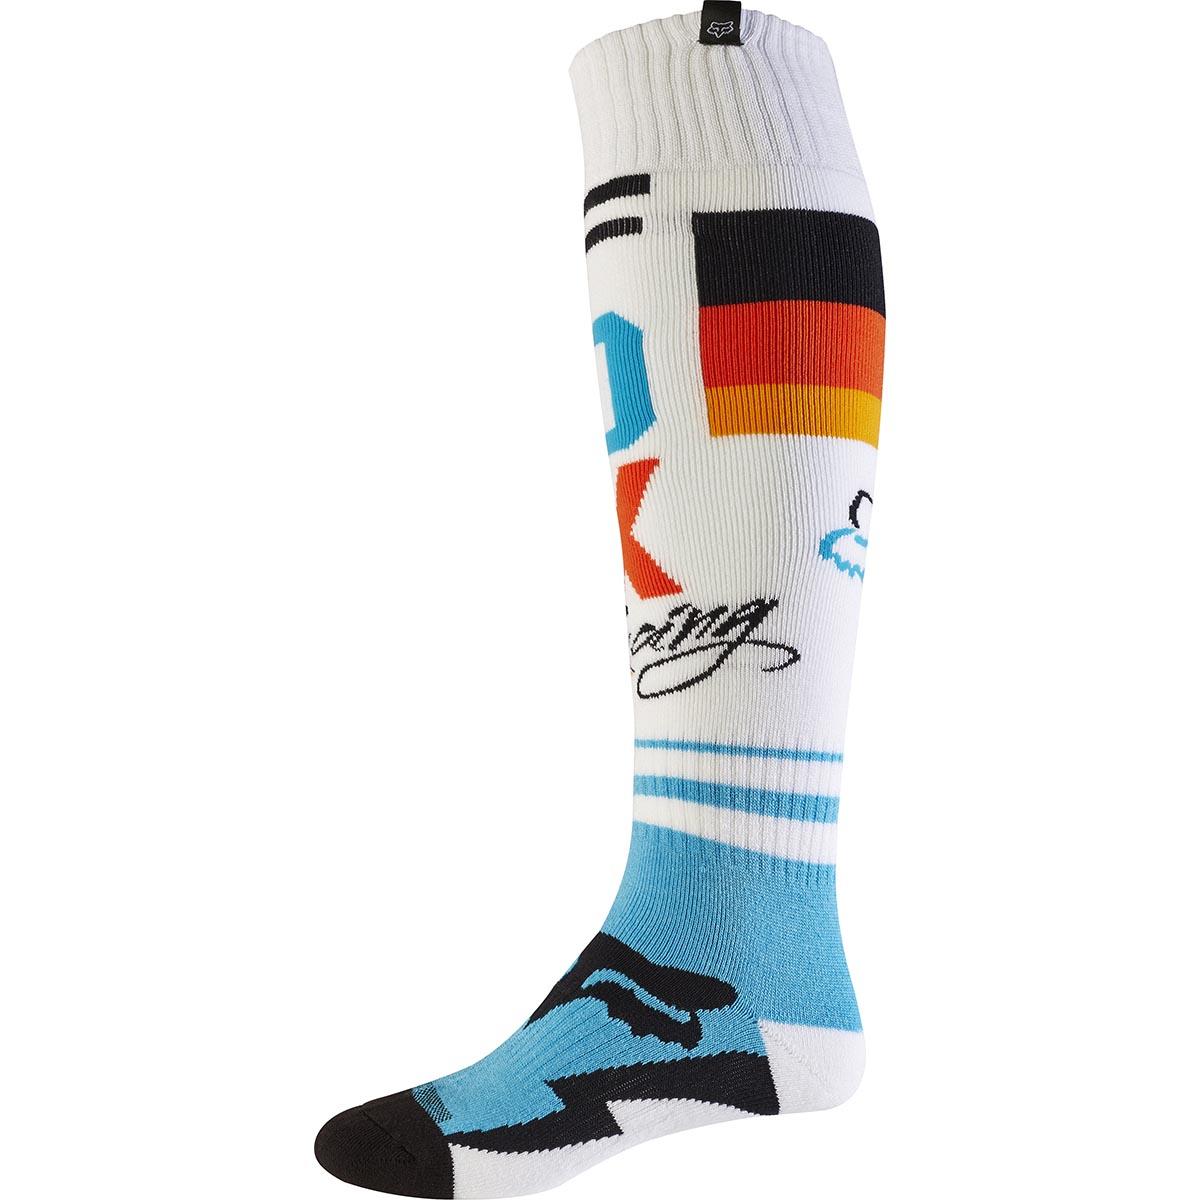 Fox - 2017 FRI Rohr Thin носки тонкие, белые